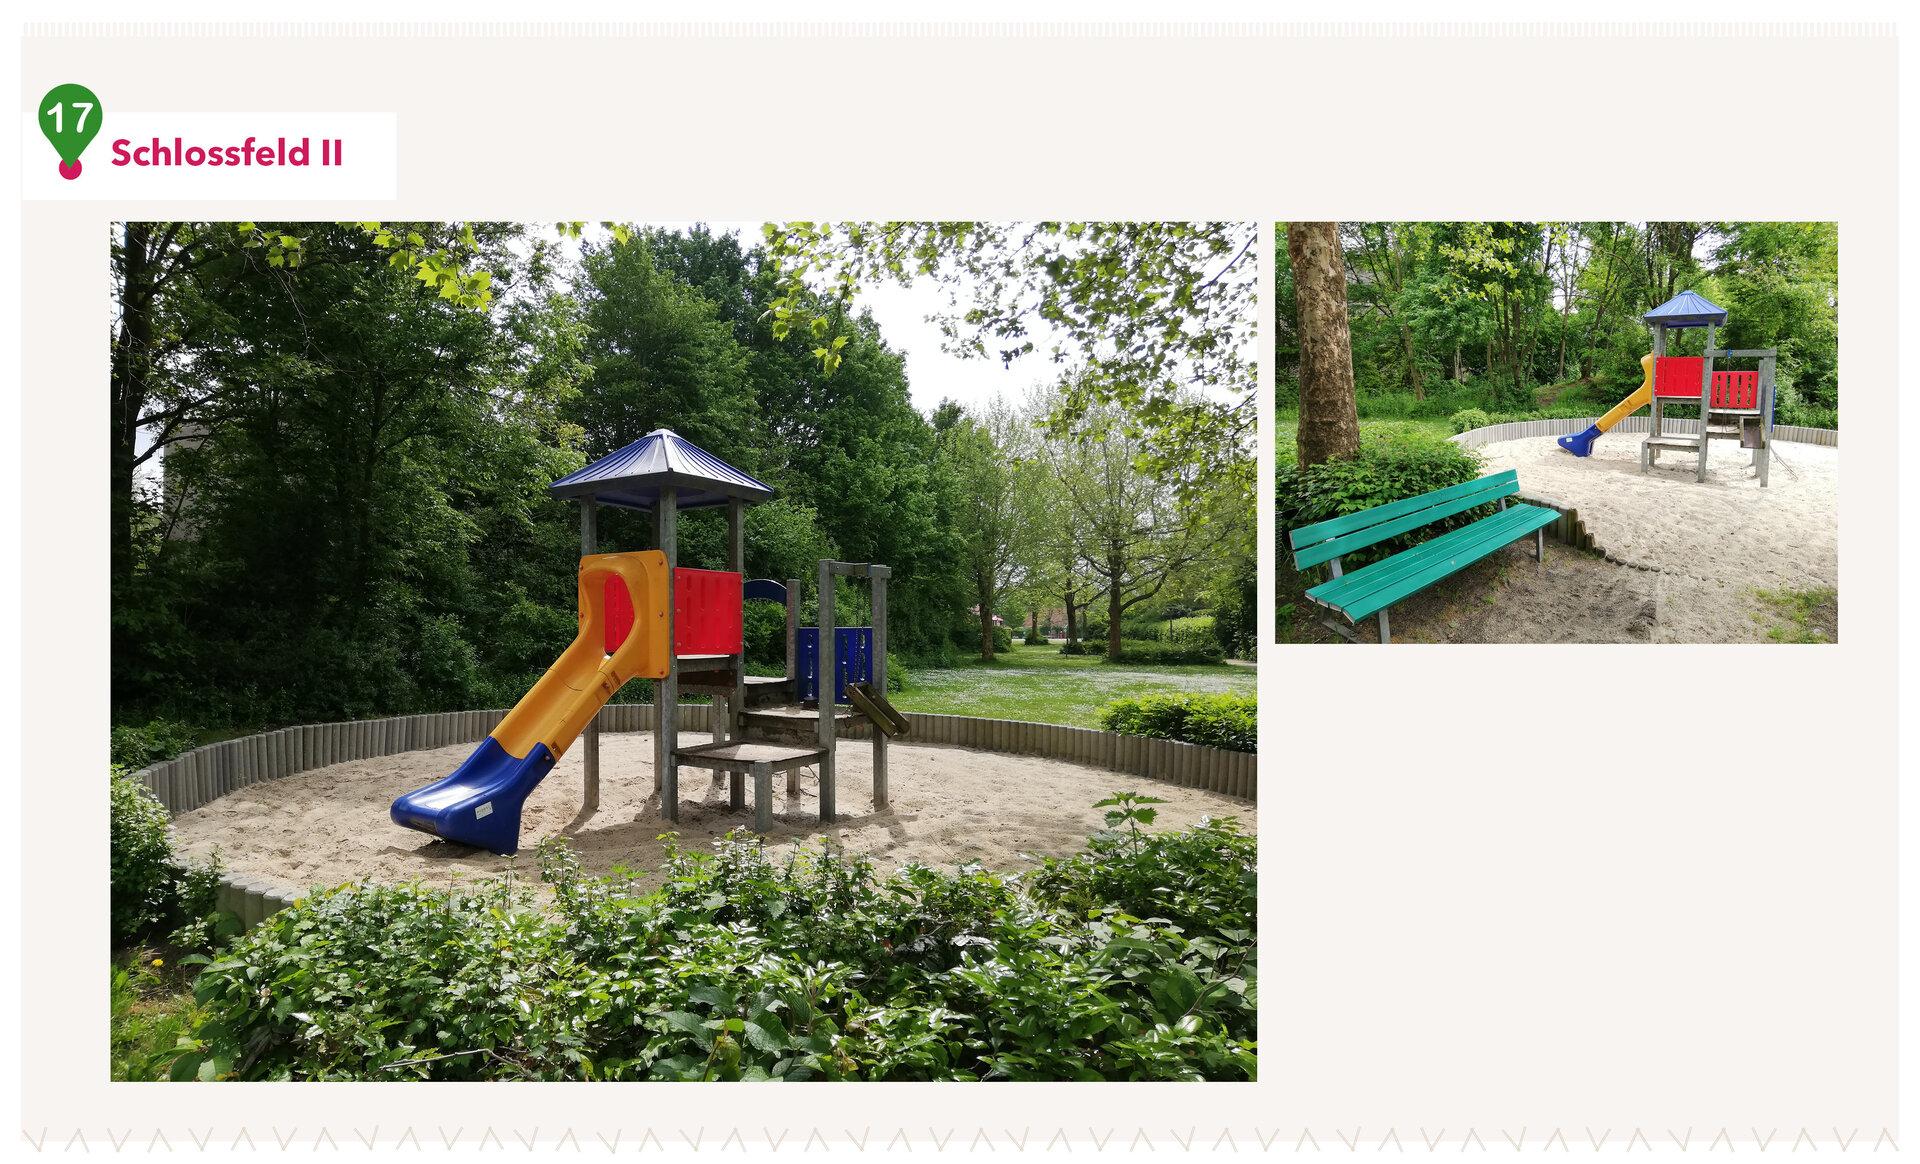 Spielplatz Schlossfeld II